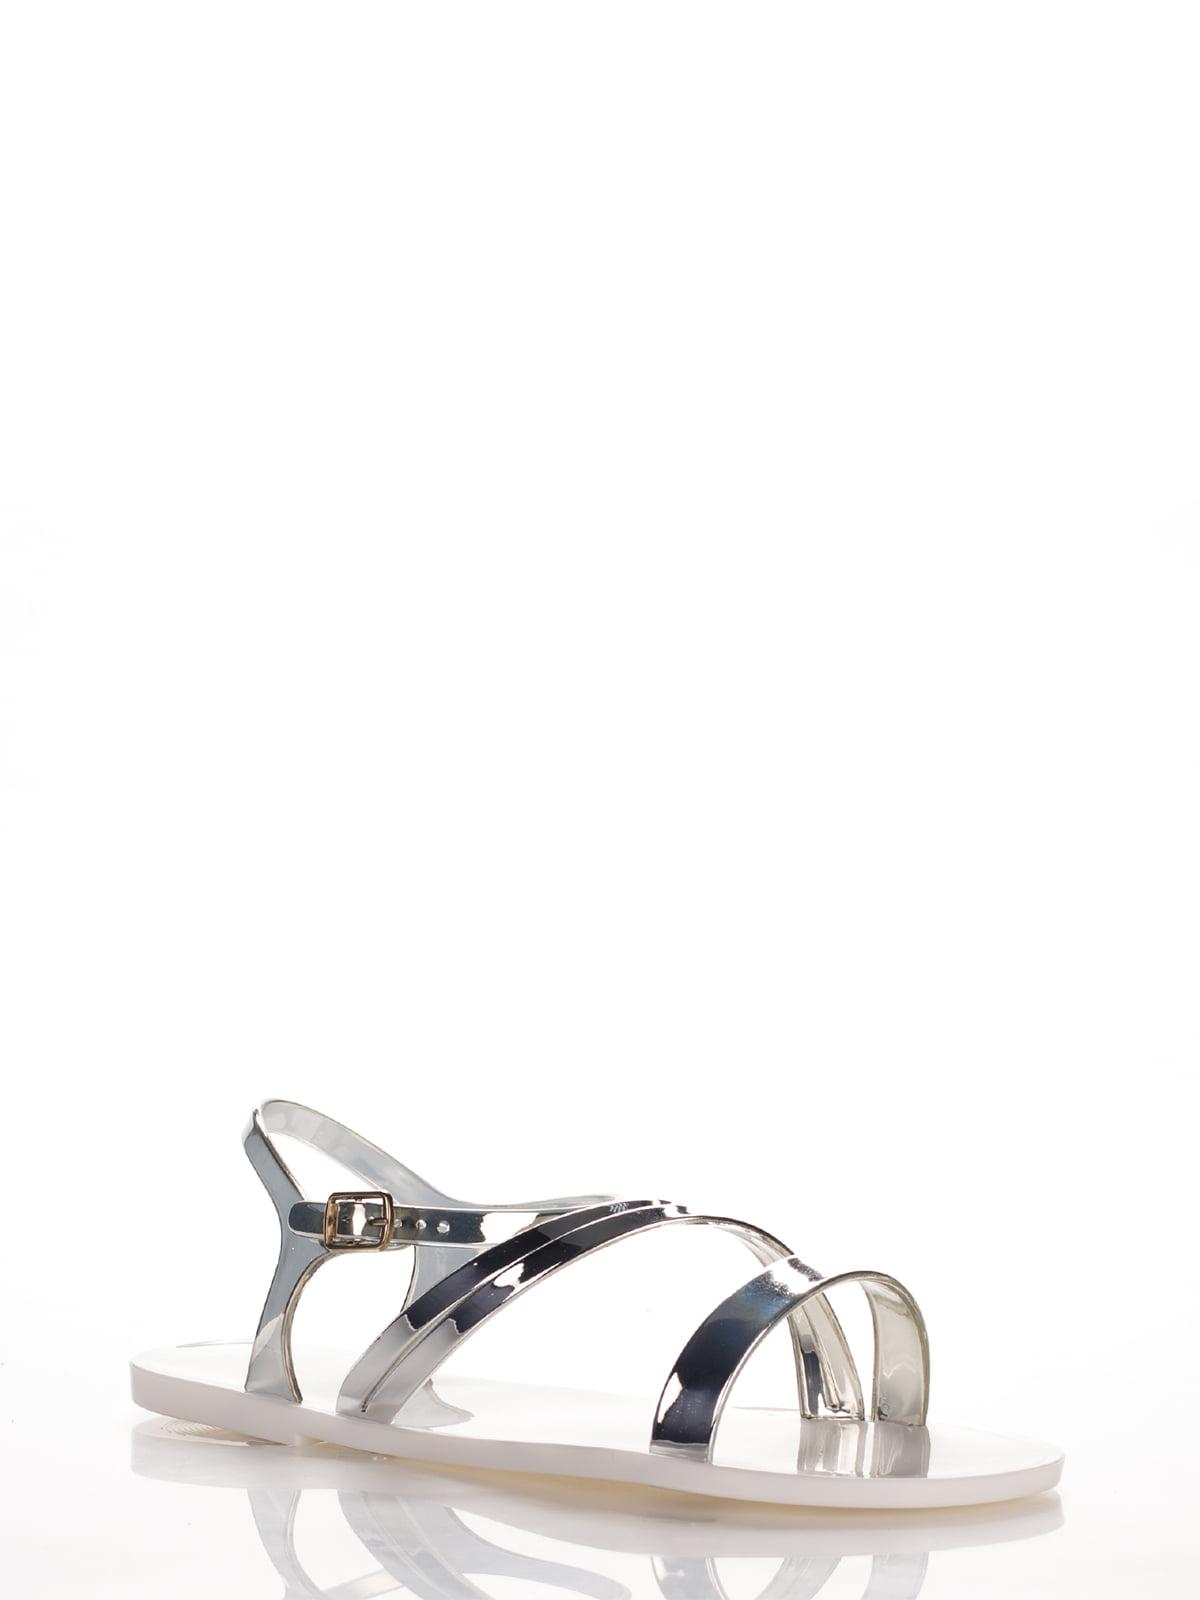 Сандалии серебристые | 2561597 | фото 2